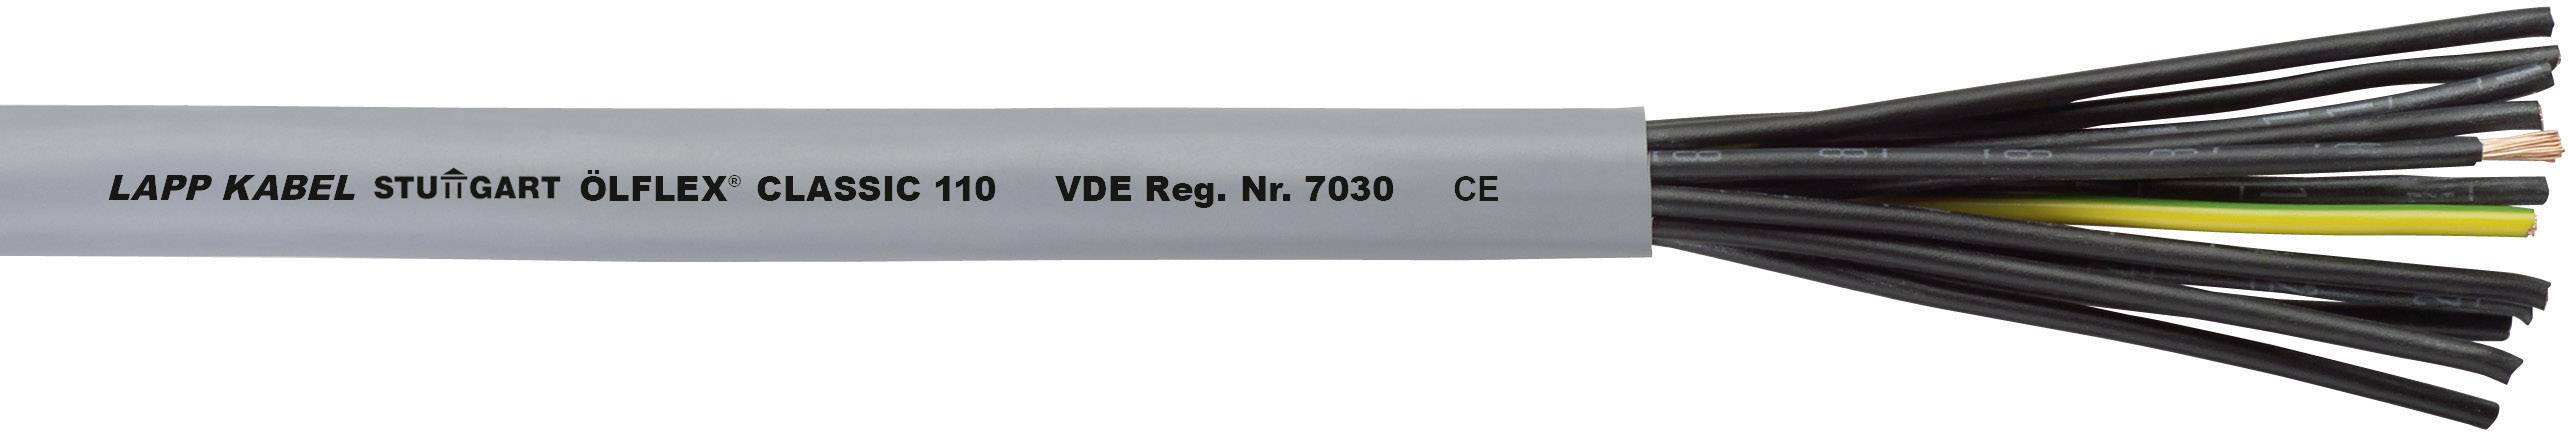 Datový kabel LappKabel Ölflex CLASSIC 110, 6 x 1,0 mm², šedá, 1 m